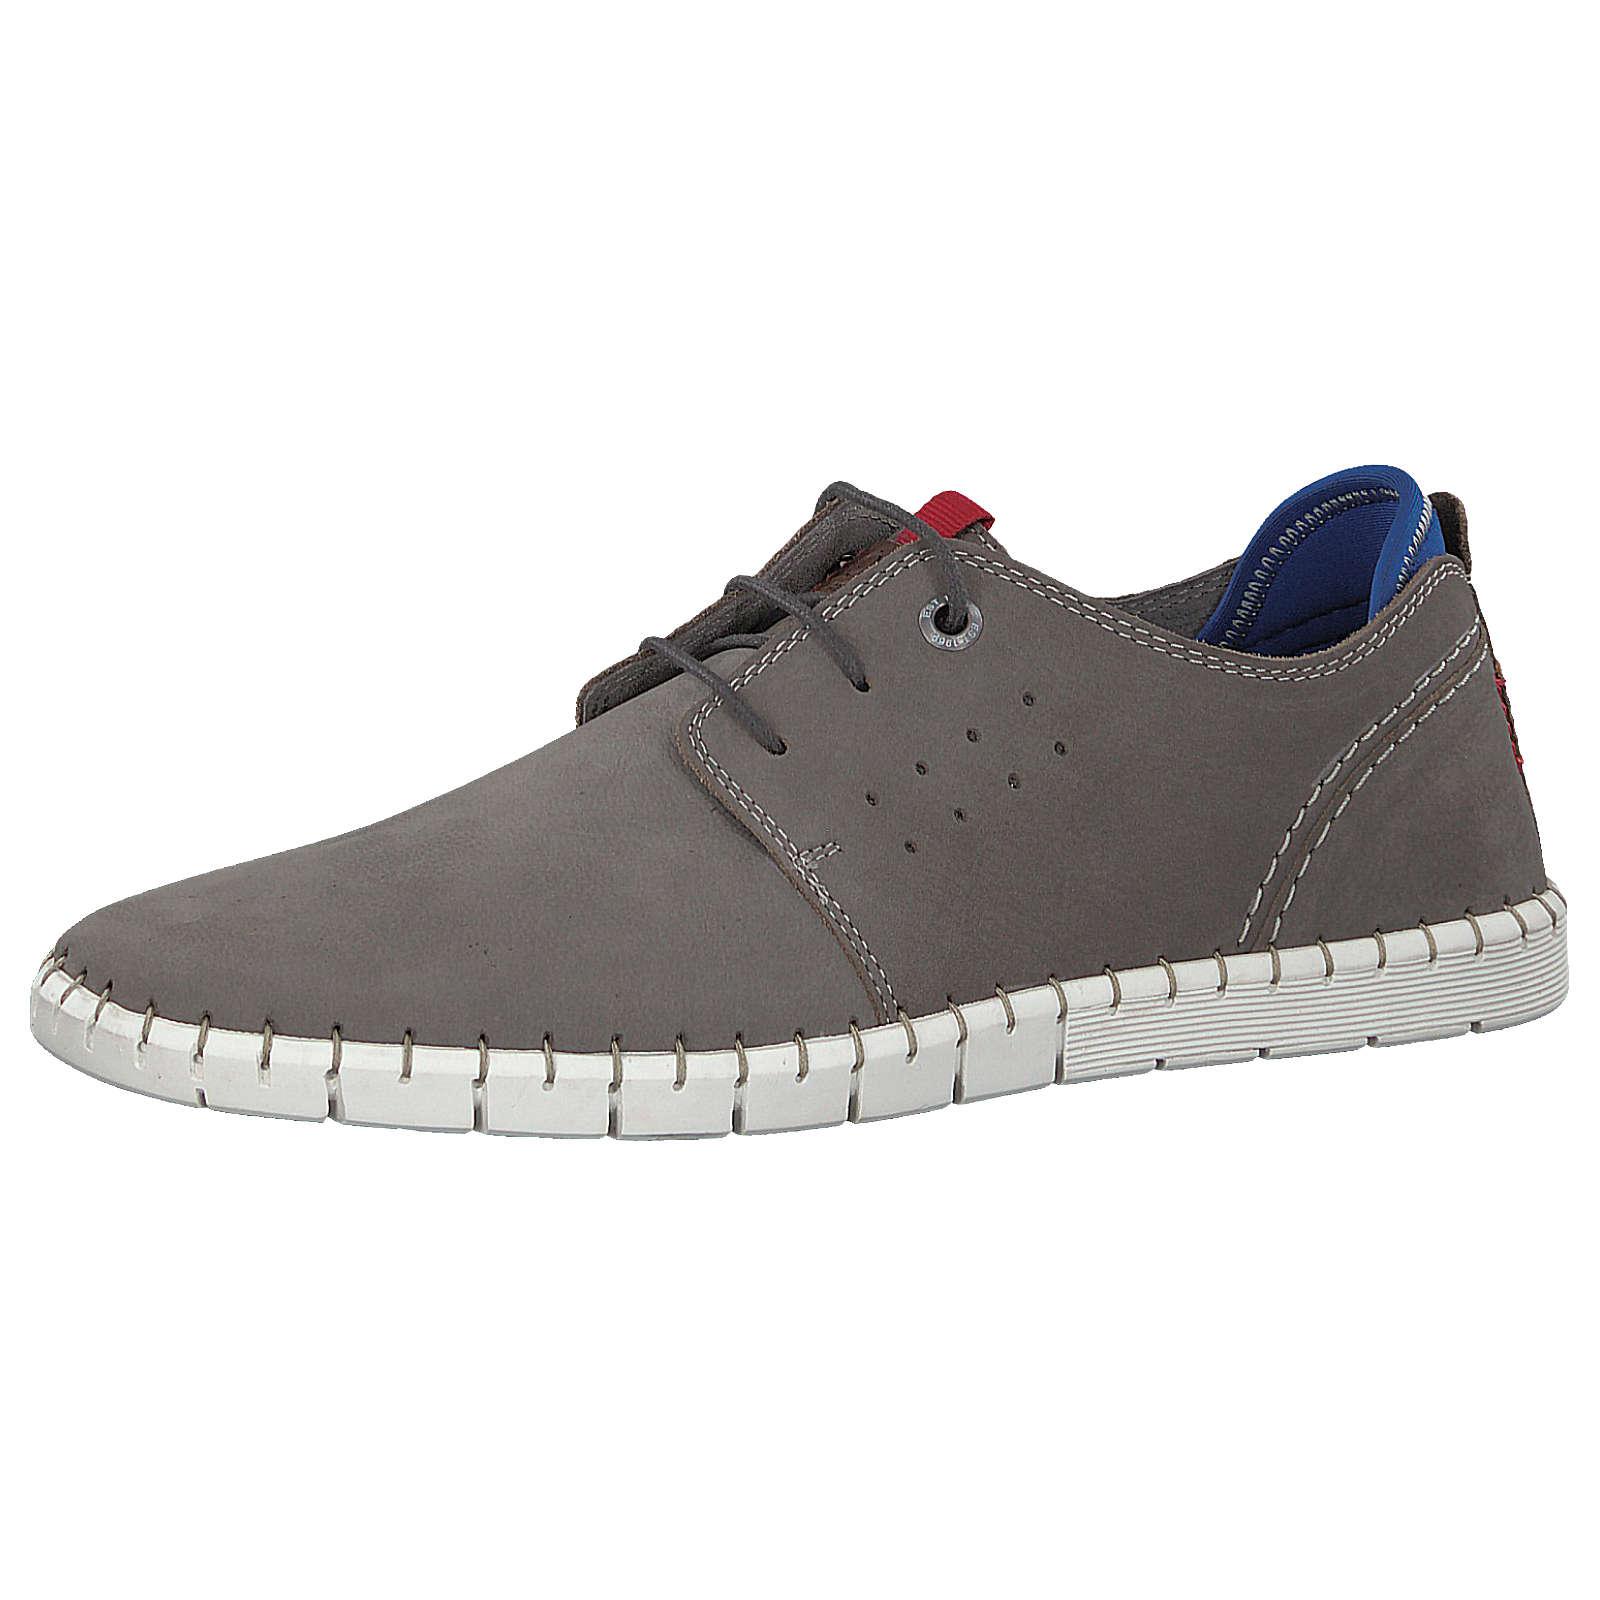 s.Oliver Sneakers Low grau Herren Gr. 44